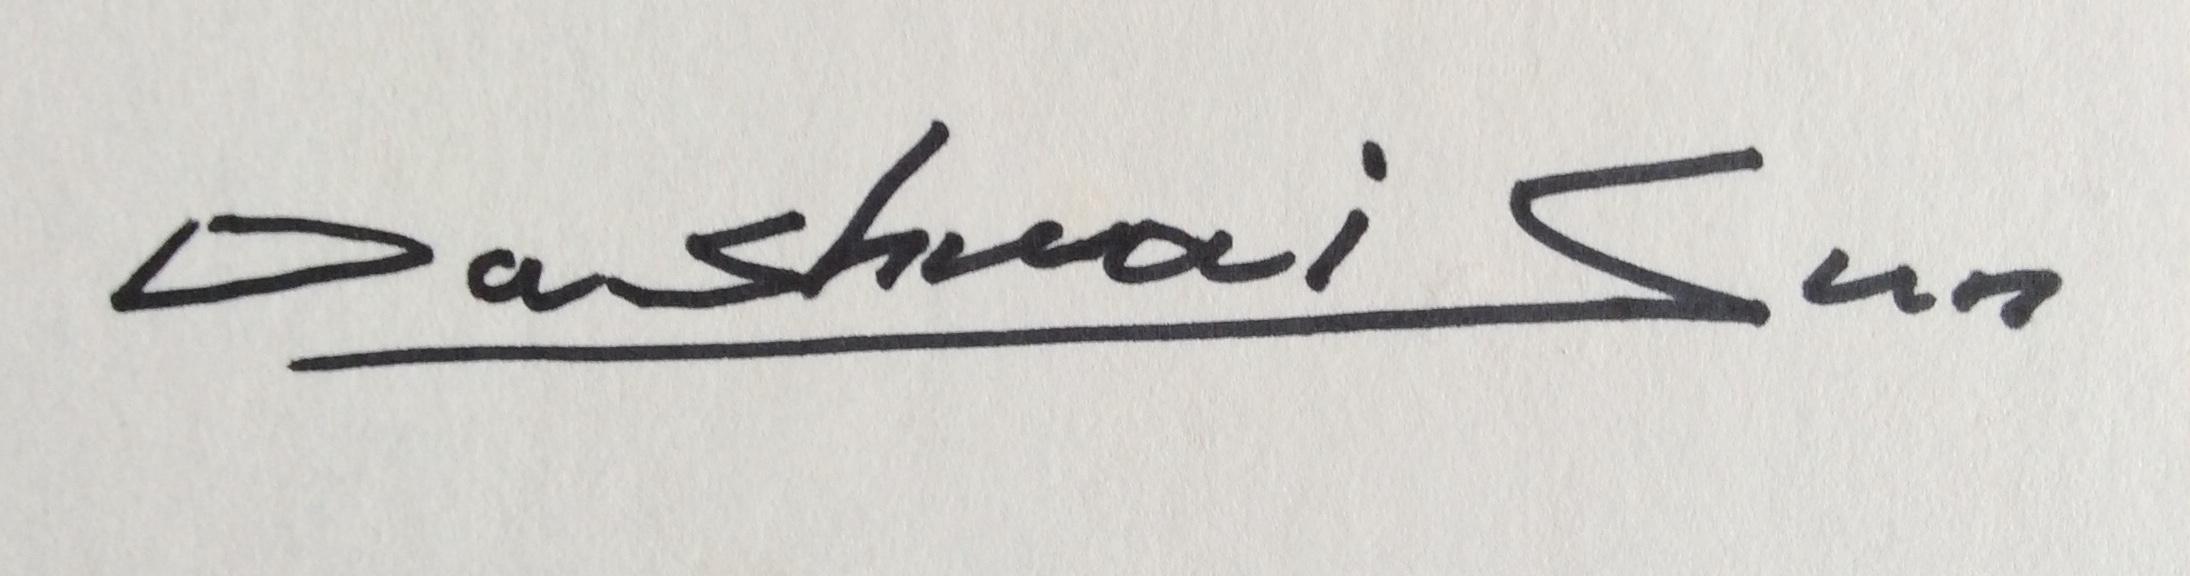 Dashuai sun's Signature